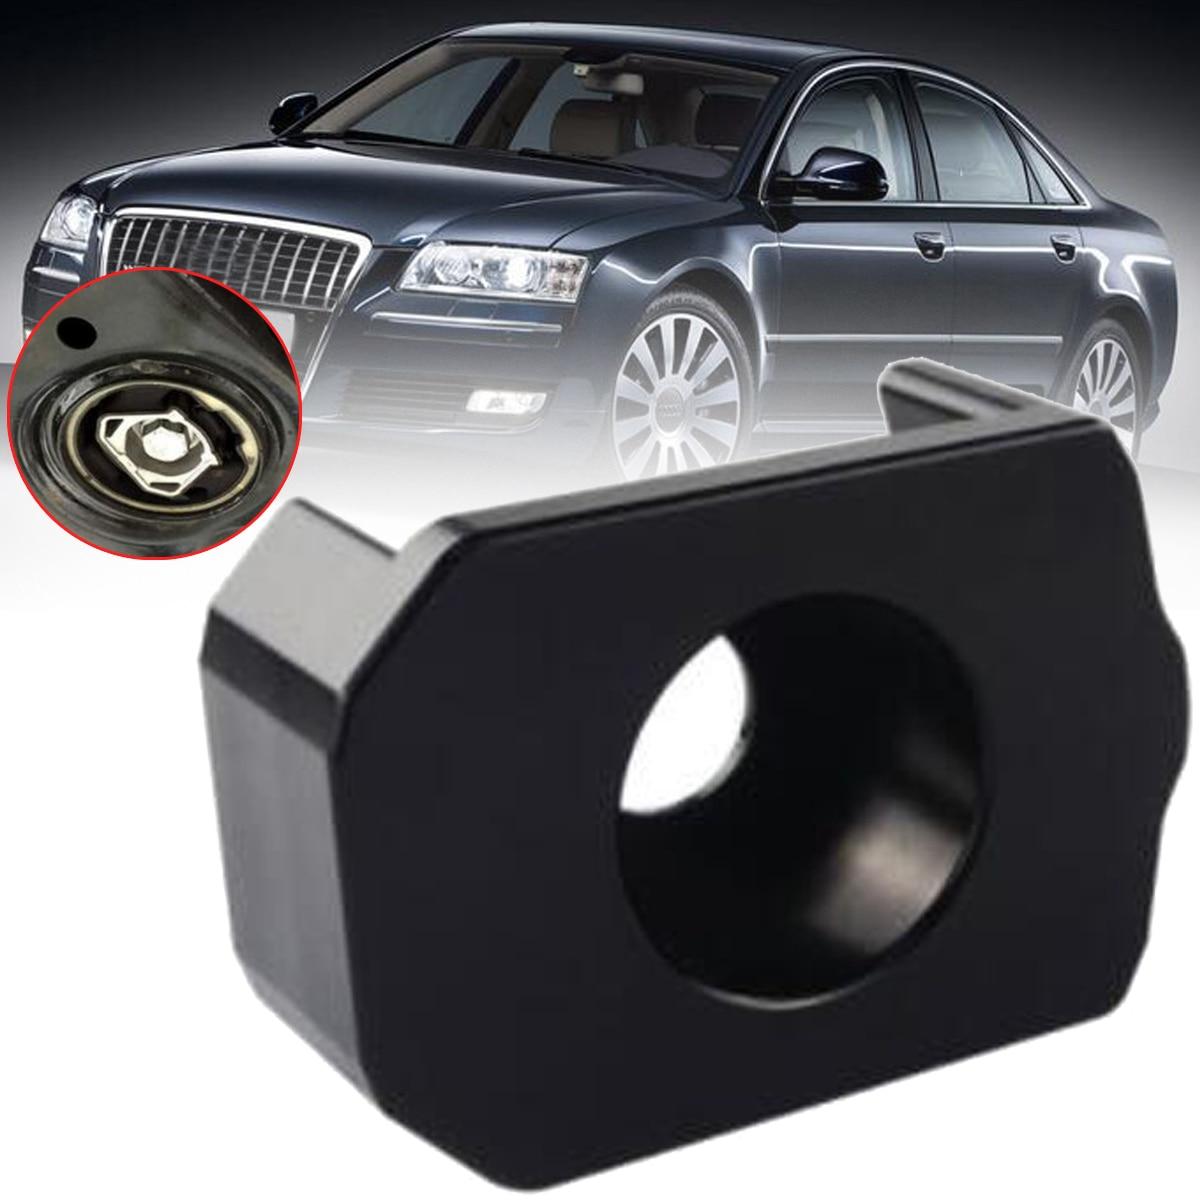 Car Billet Aluminum MQB Dog Bone Dogbone Mount Insert Fits For VW Volkswagen Mk7 Golf  GTI  R 8V For Audi A3 S3 RS3 TT TTS TTRS